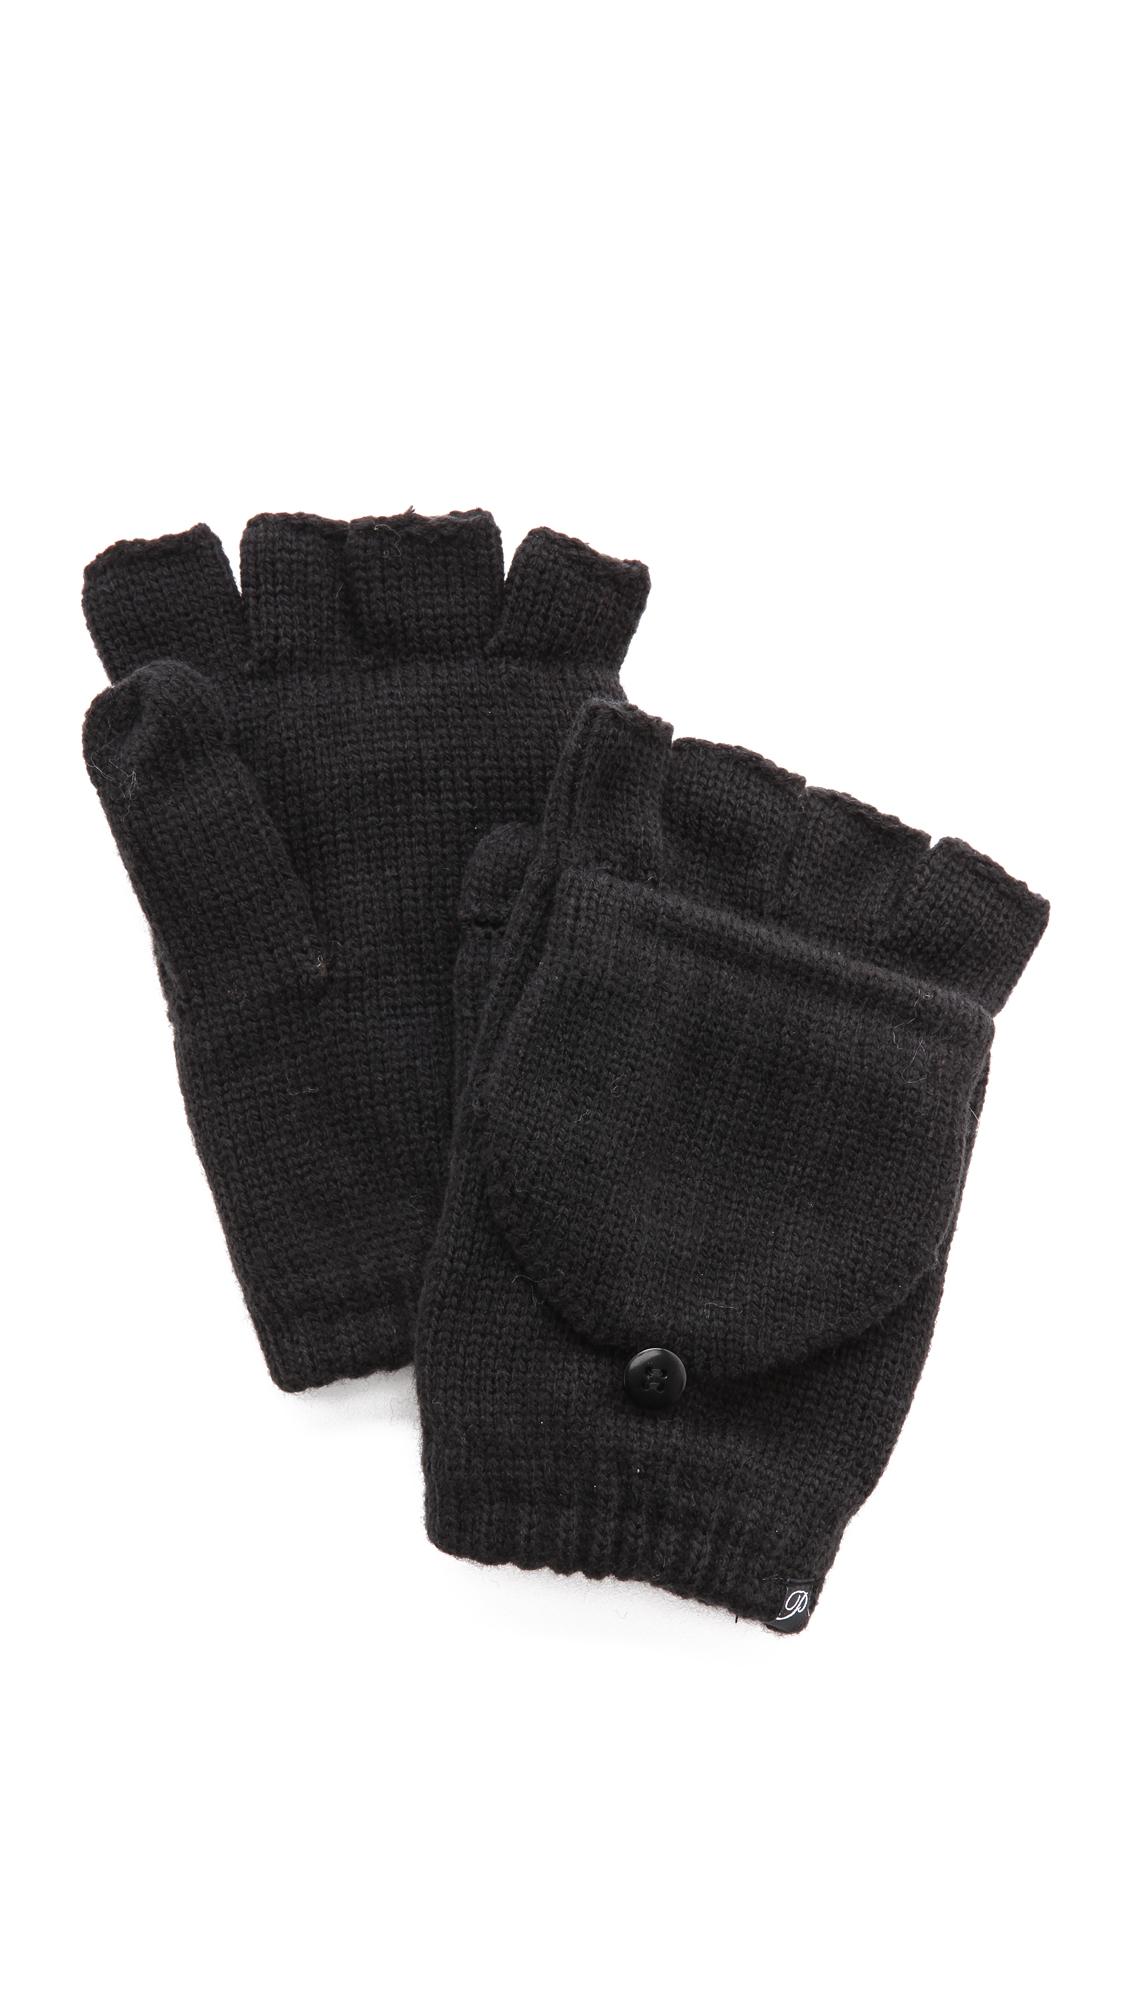 Plush Fleece Lined Texting Mittens - Black